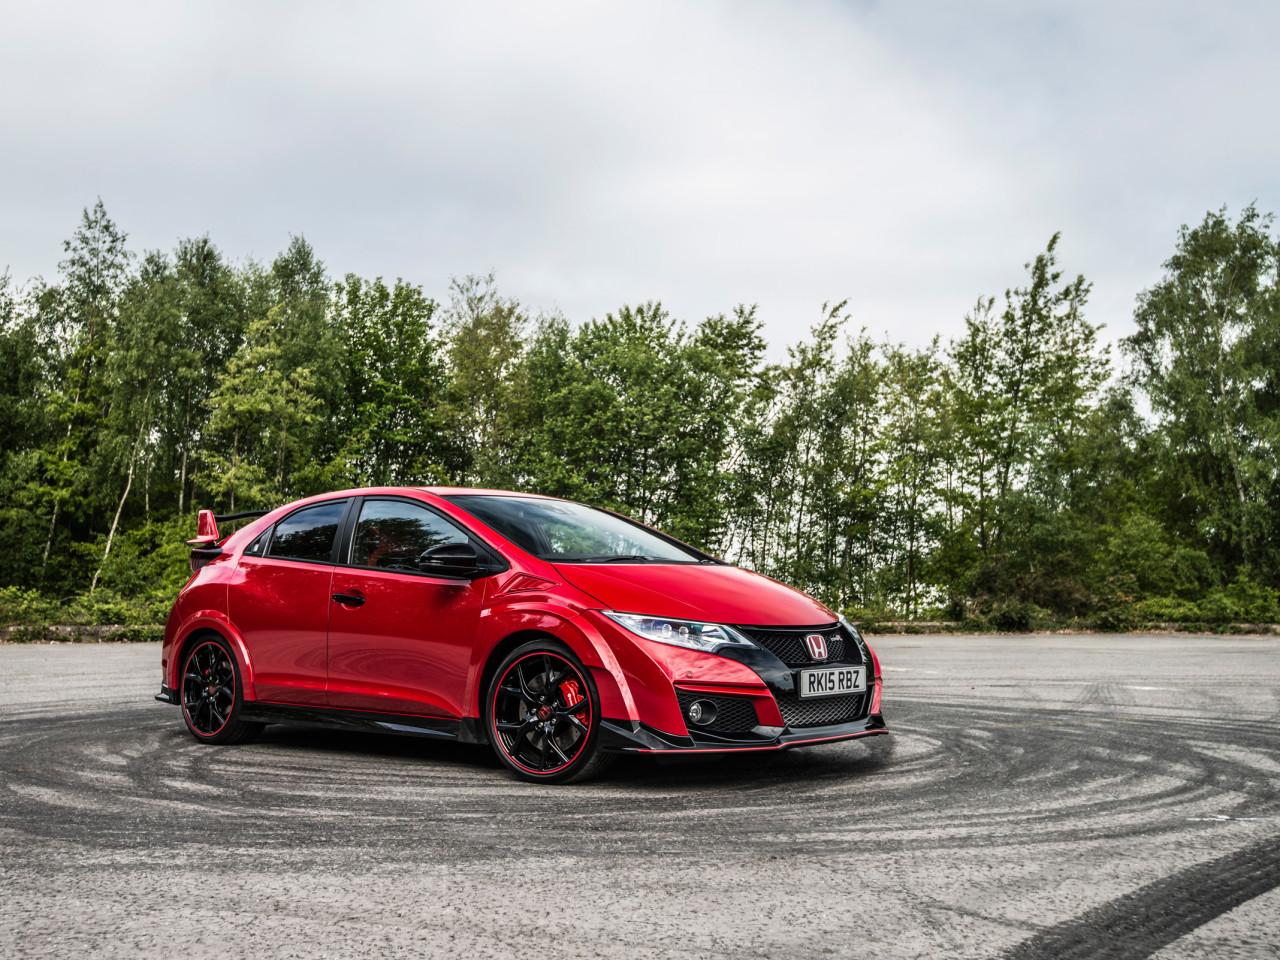 Civic Type R Red RHD HD Wallpaper 6249 1280x960